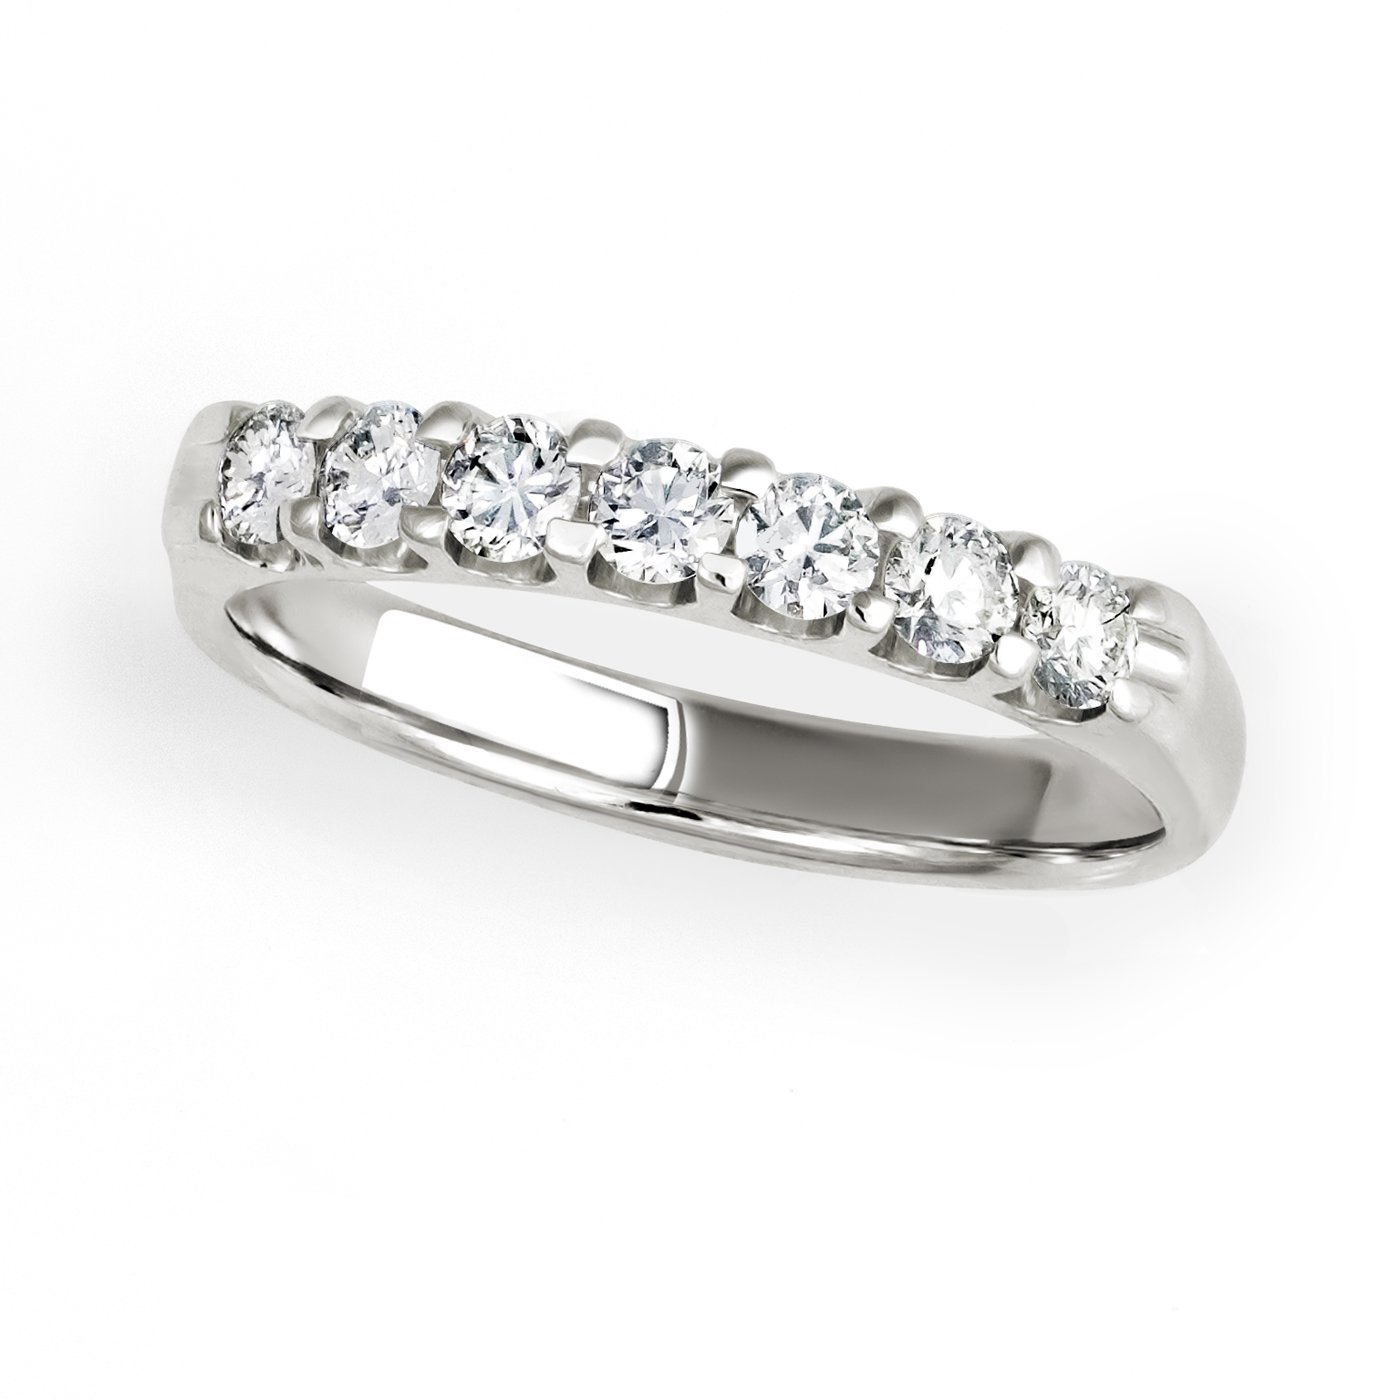 14KT White Gold 1/2ct G-I SI1/SI2 7 Stones Machine Set Wedding Ring